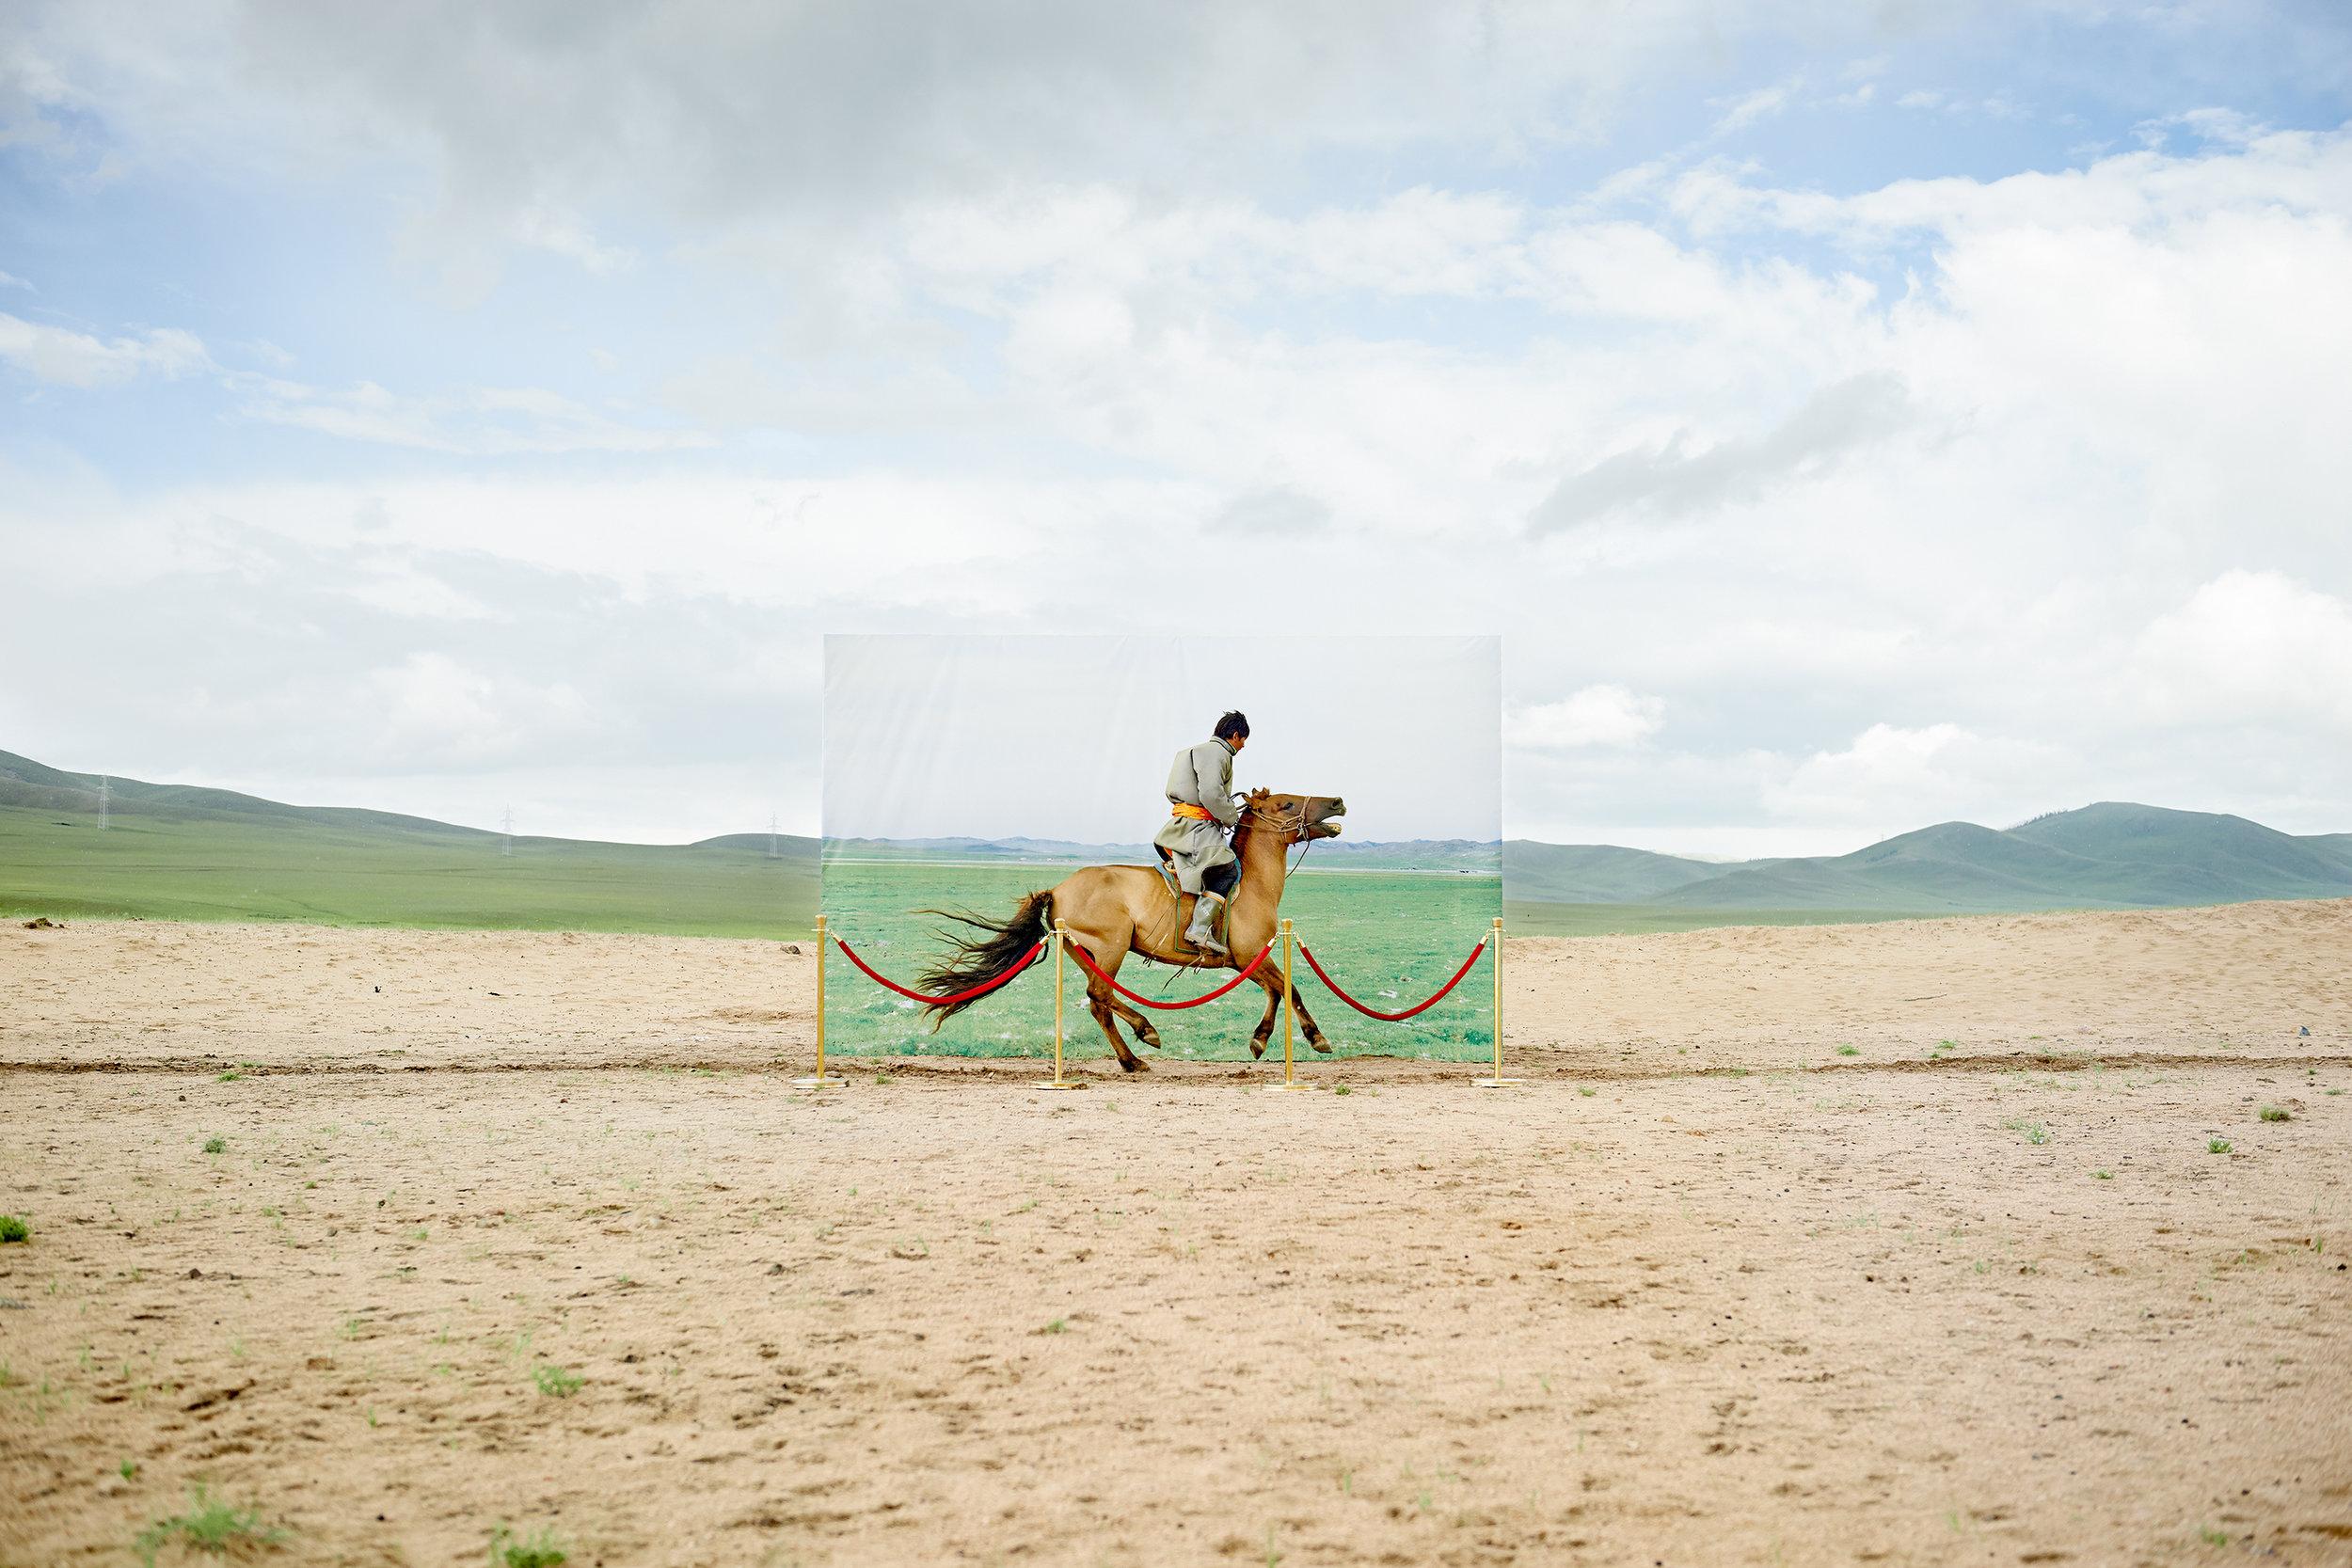 01 Daesung Lee futuristic archaeology  2014 South Korea.jpg